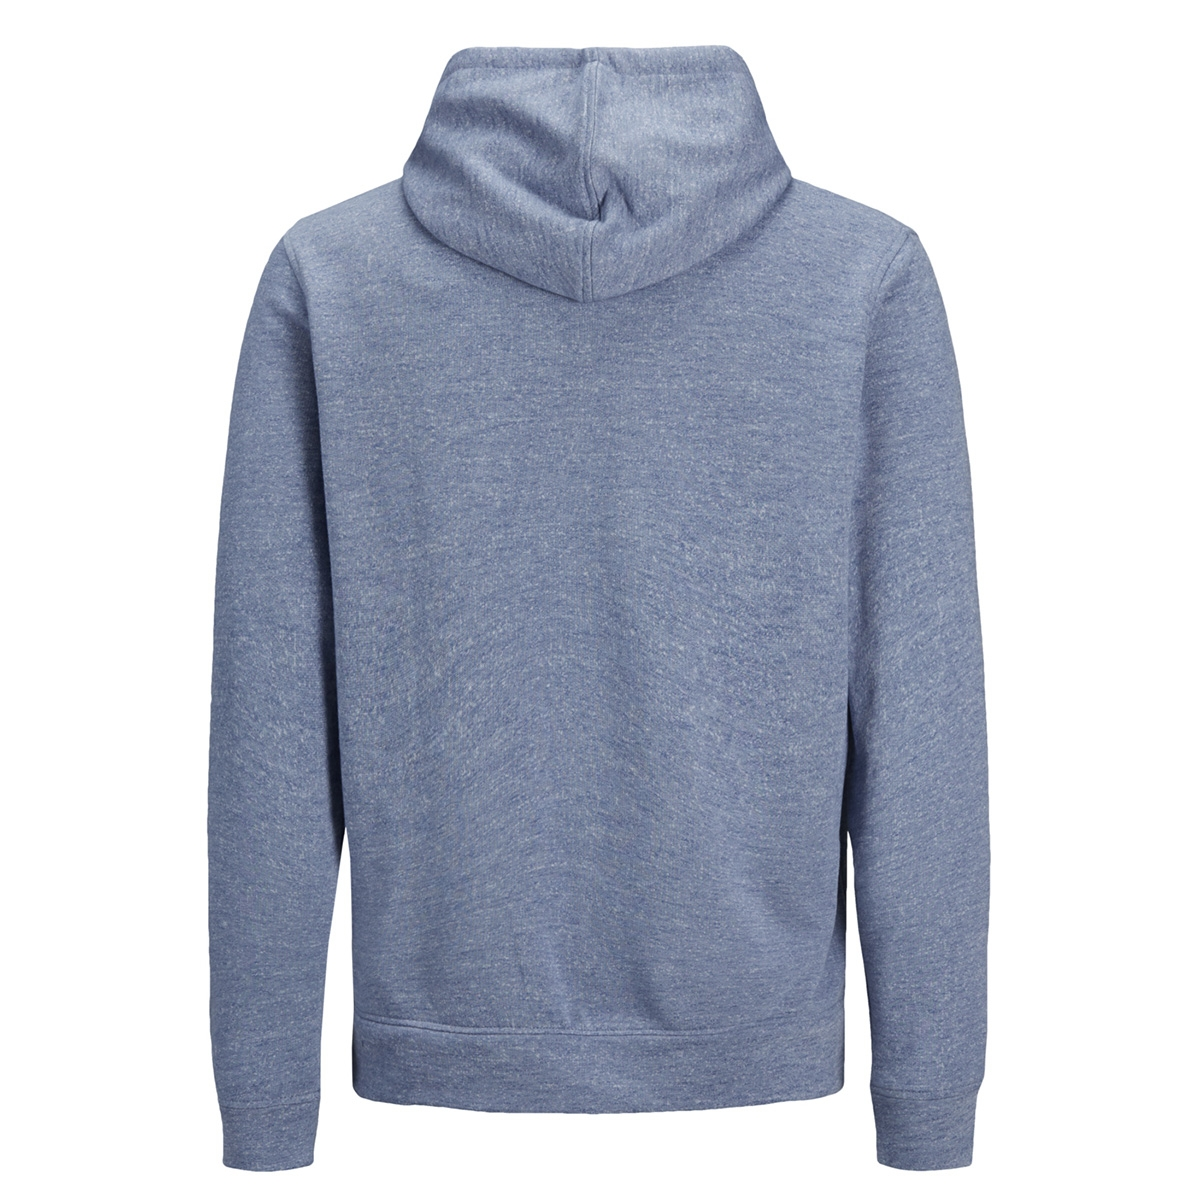 jjepanther sweat hood noos 12141011 jack & jones sweater infinity/reg fit